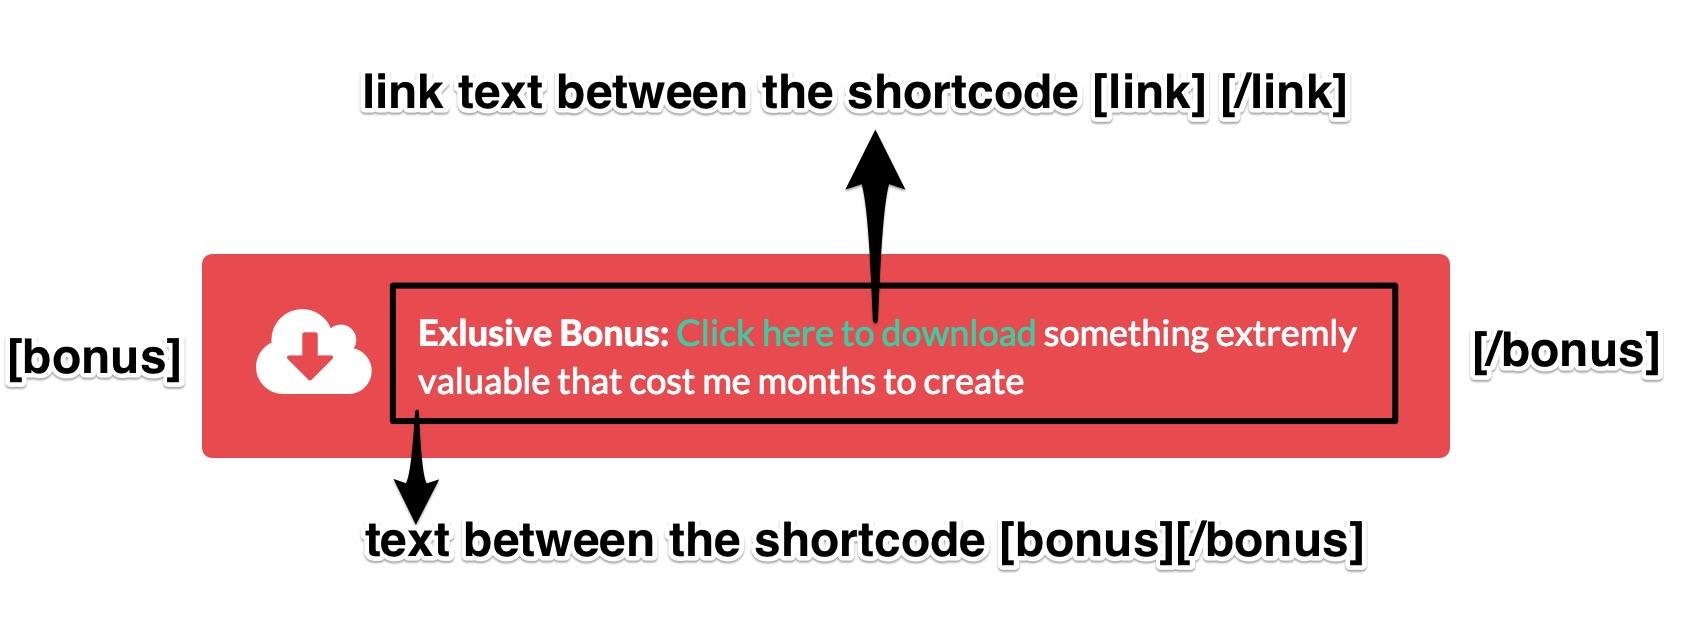 _images/post-specific-bonus-notification-box-parameters.jpg